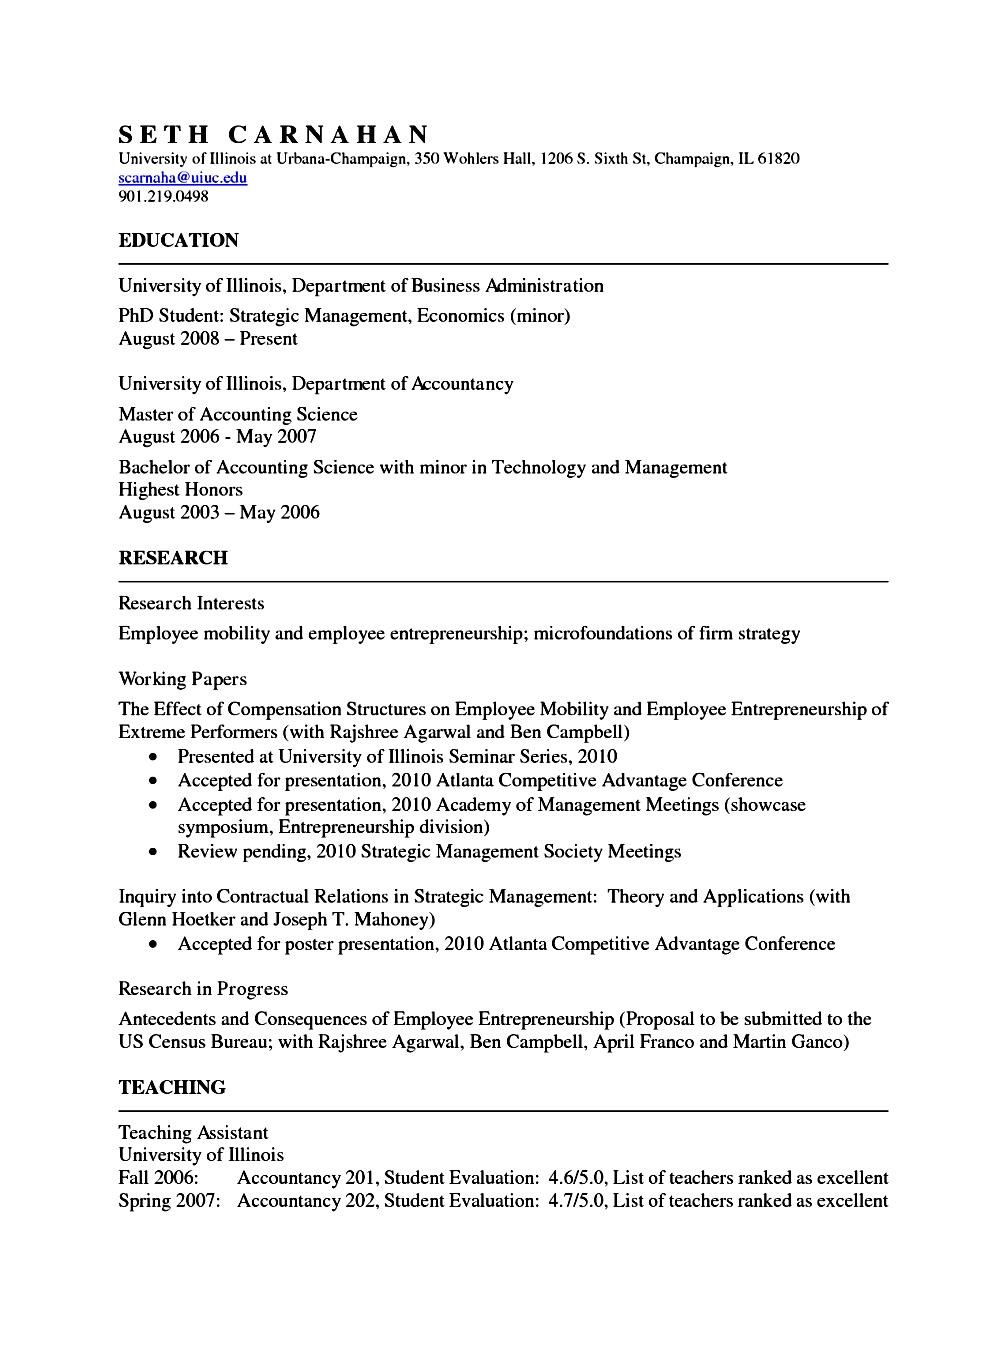 Academic resume format